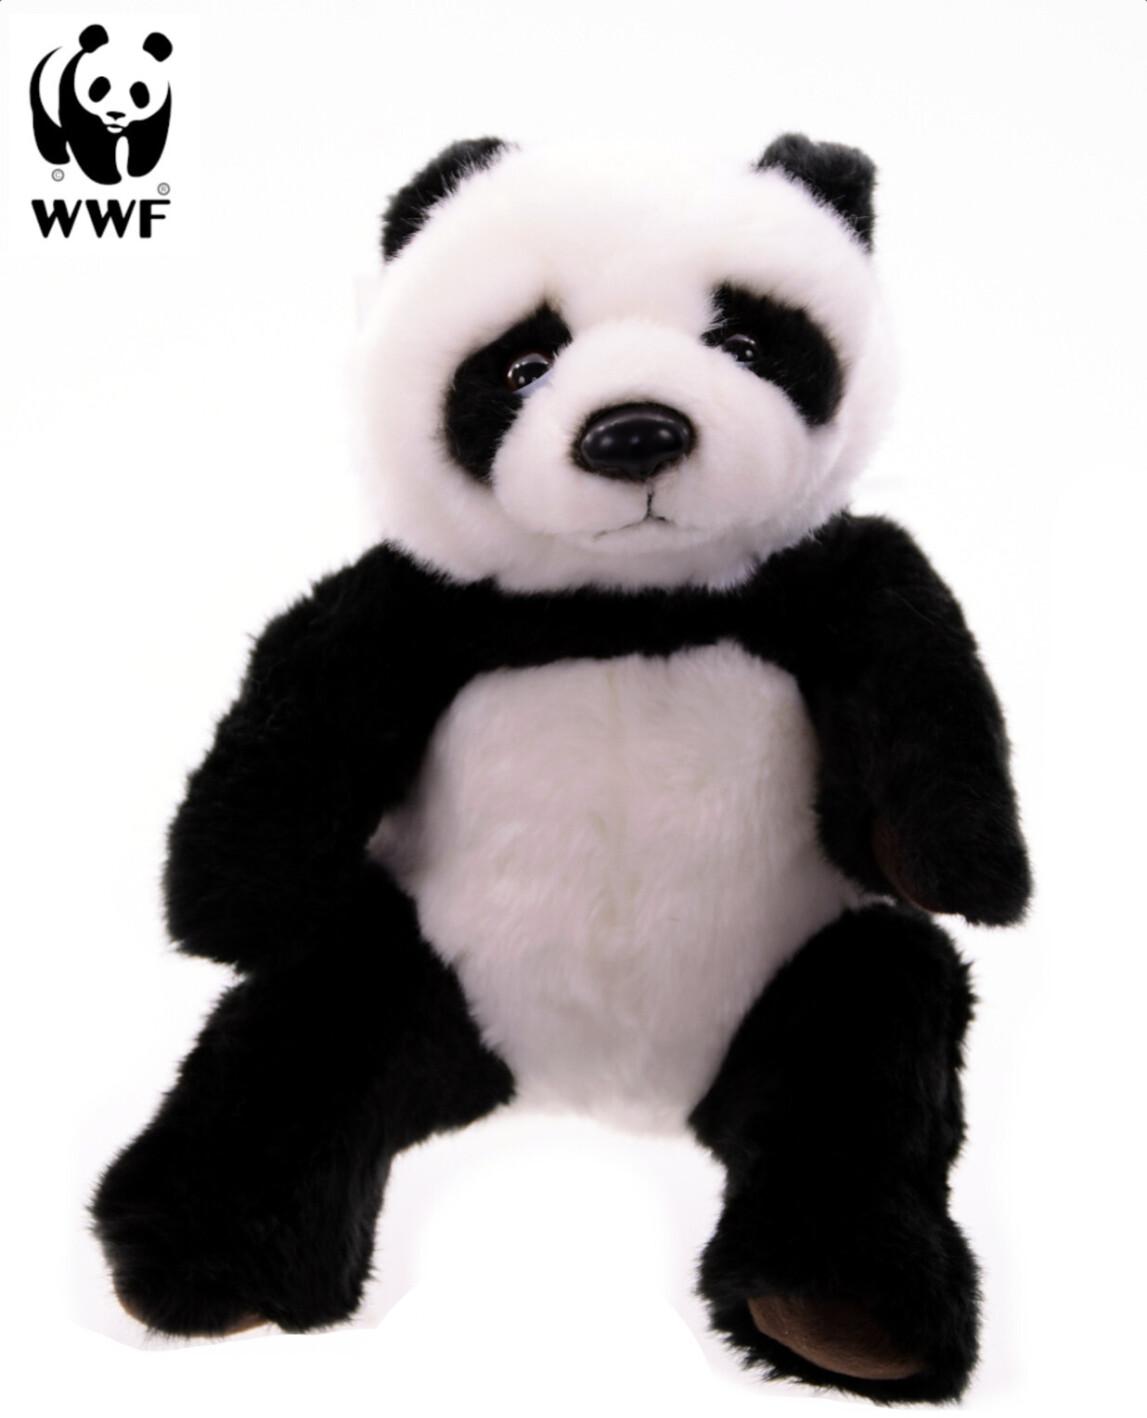 WWF Plüschtier Panda 25cm